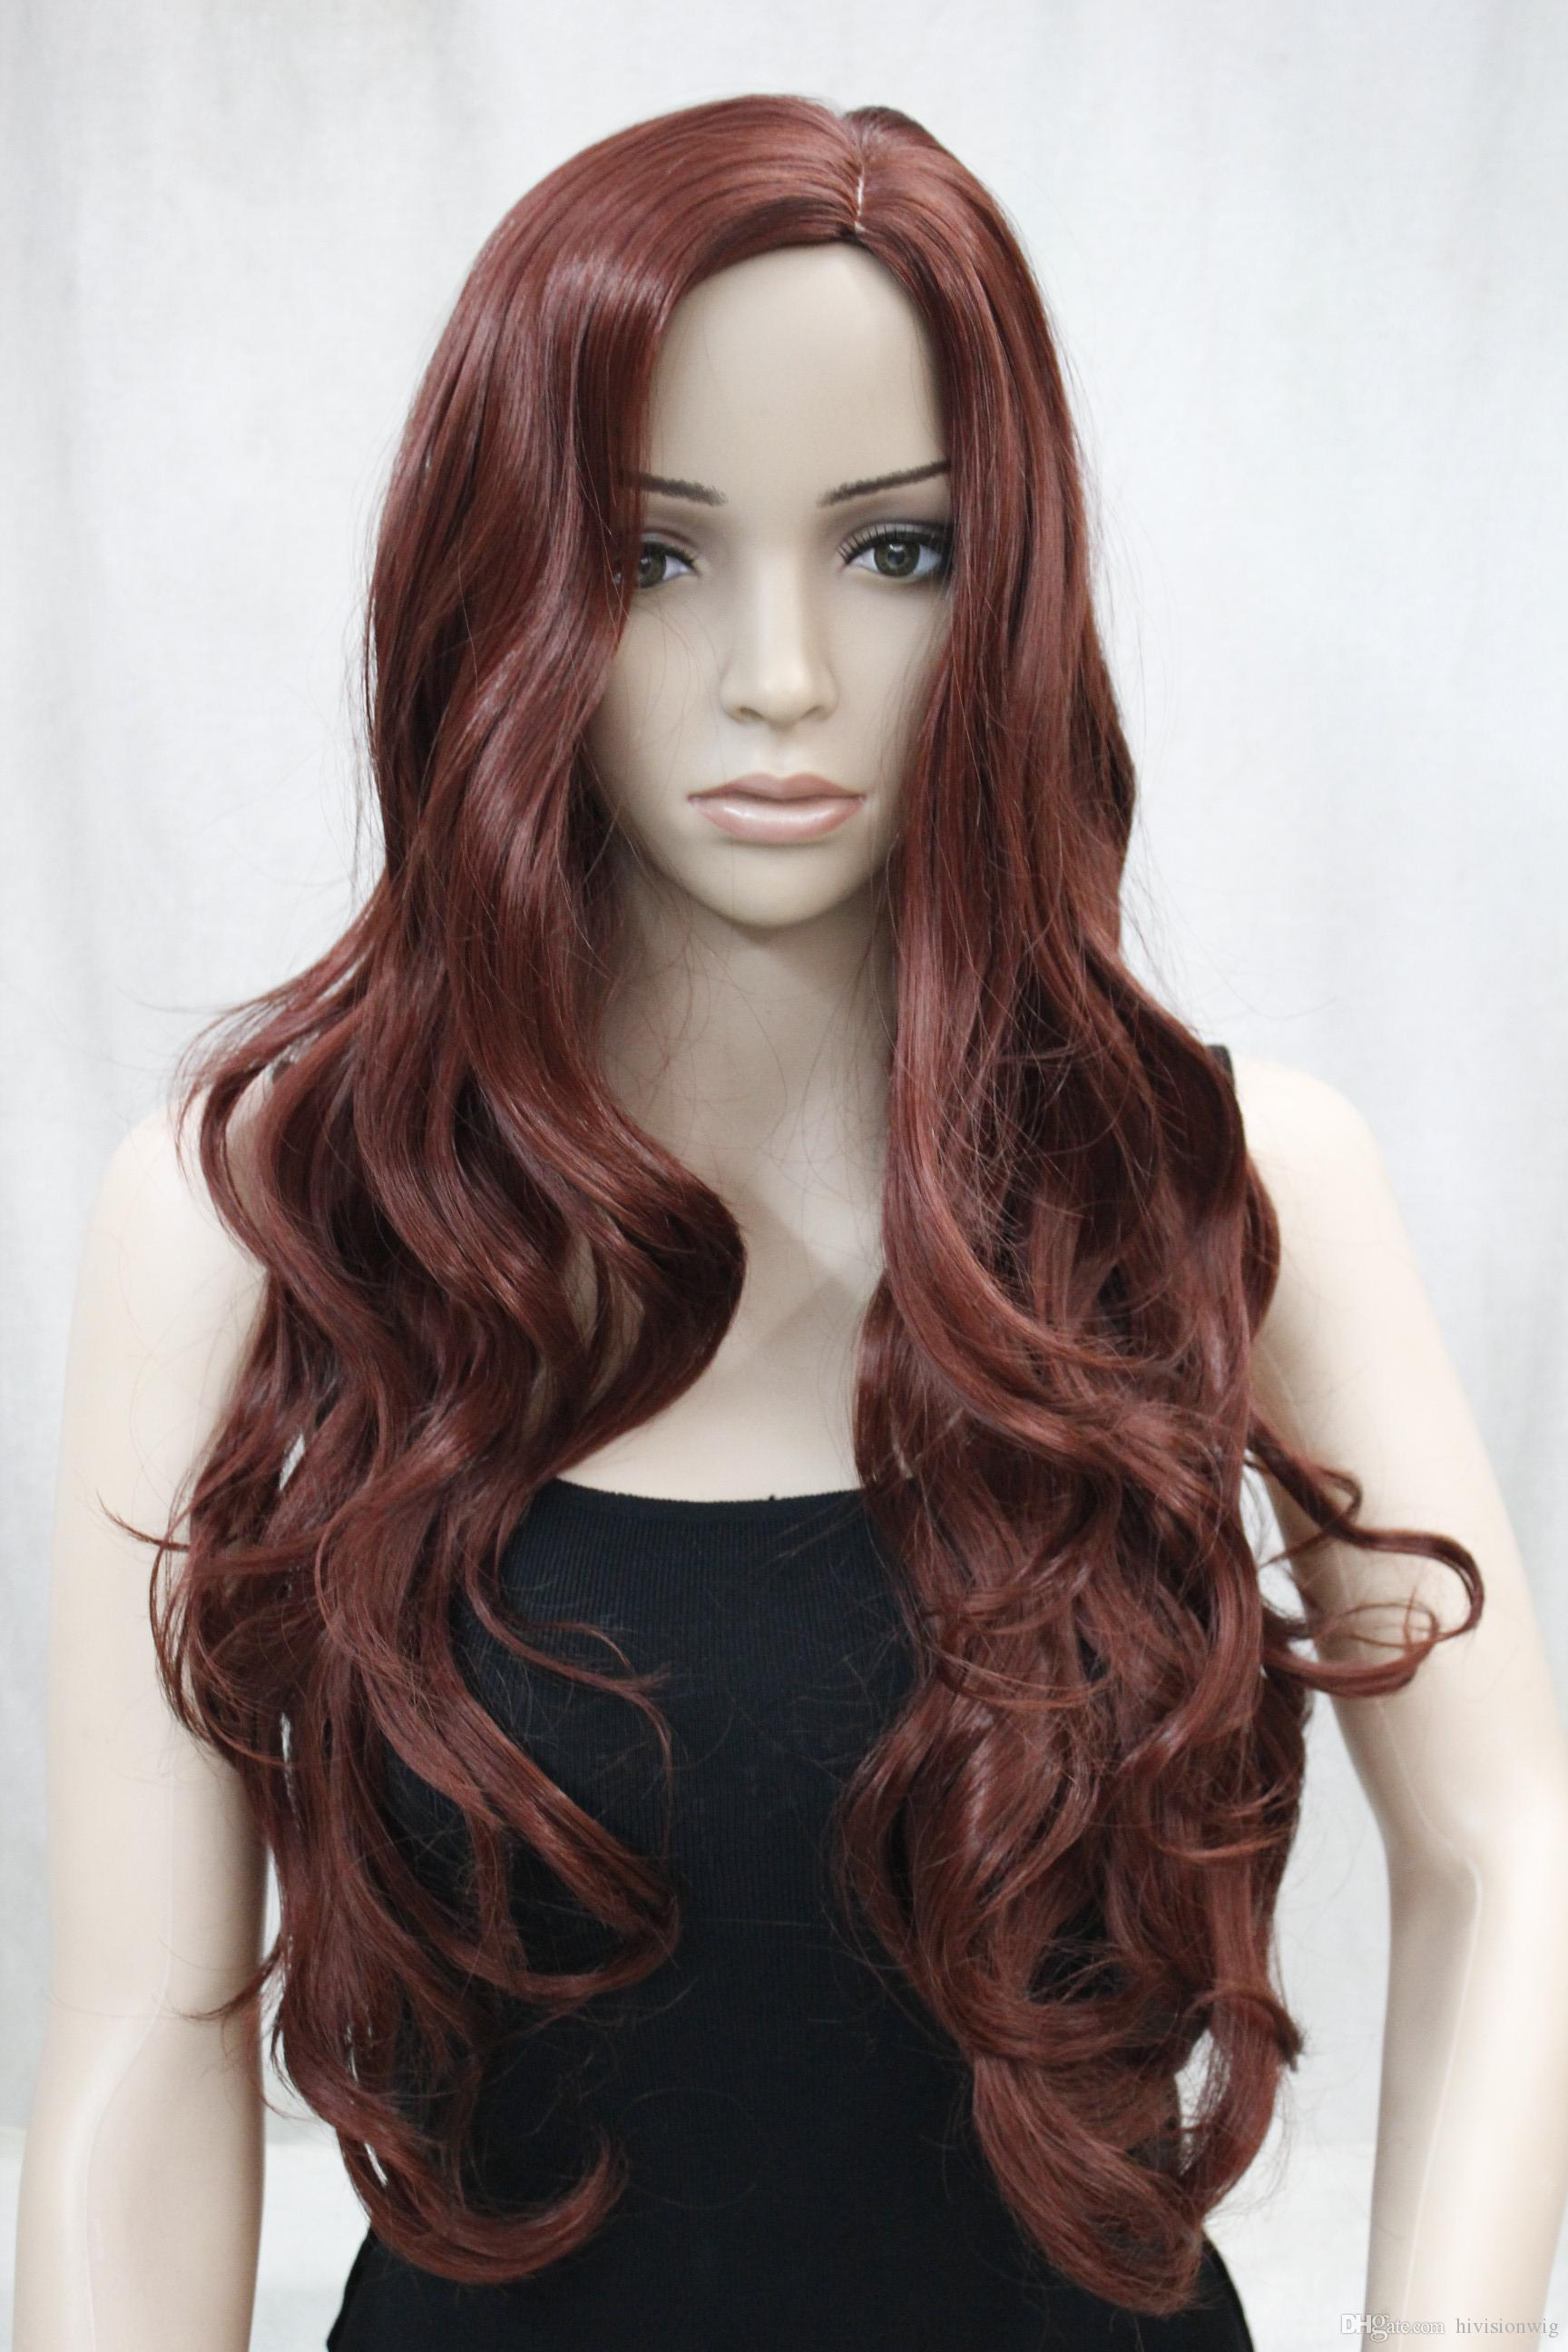 New Fashion No Bangs Side Skin Part Top Women S Burgandy Red Long